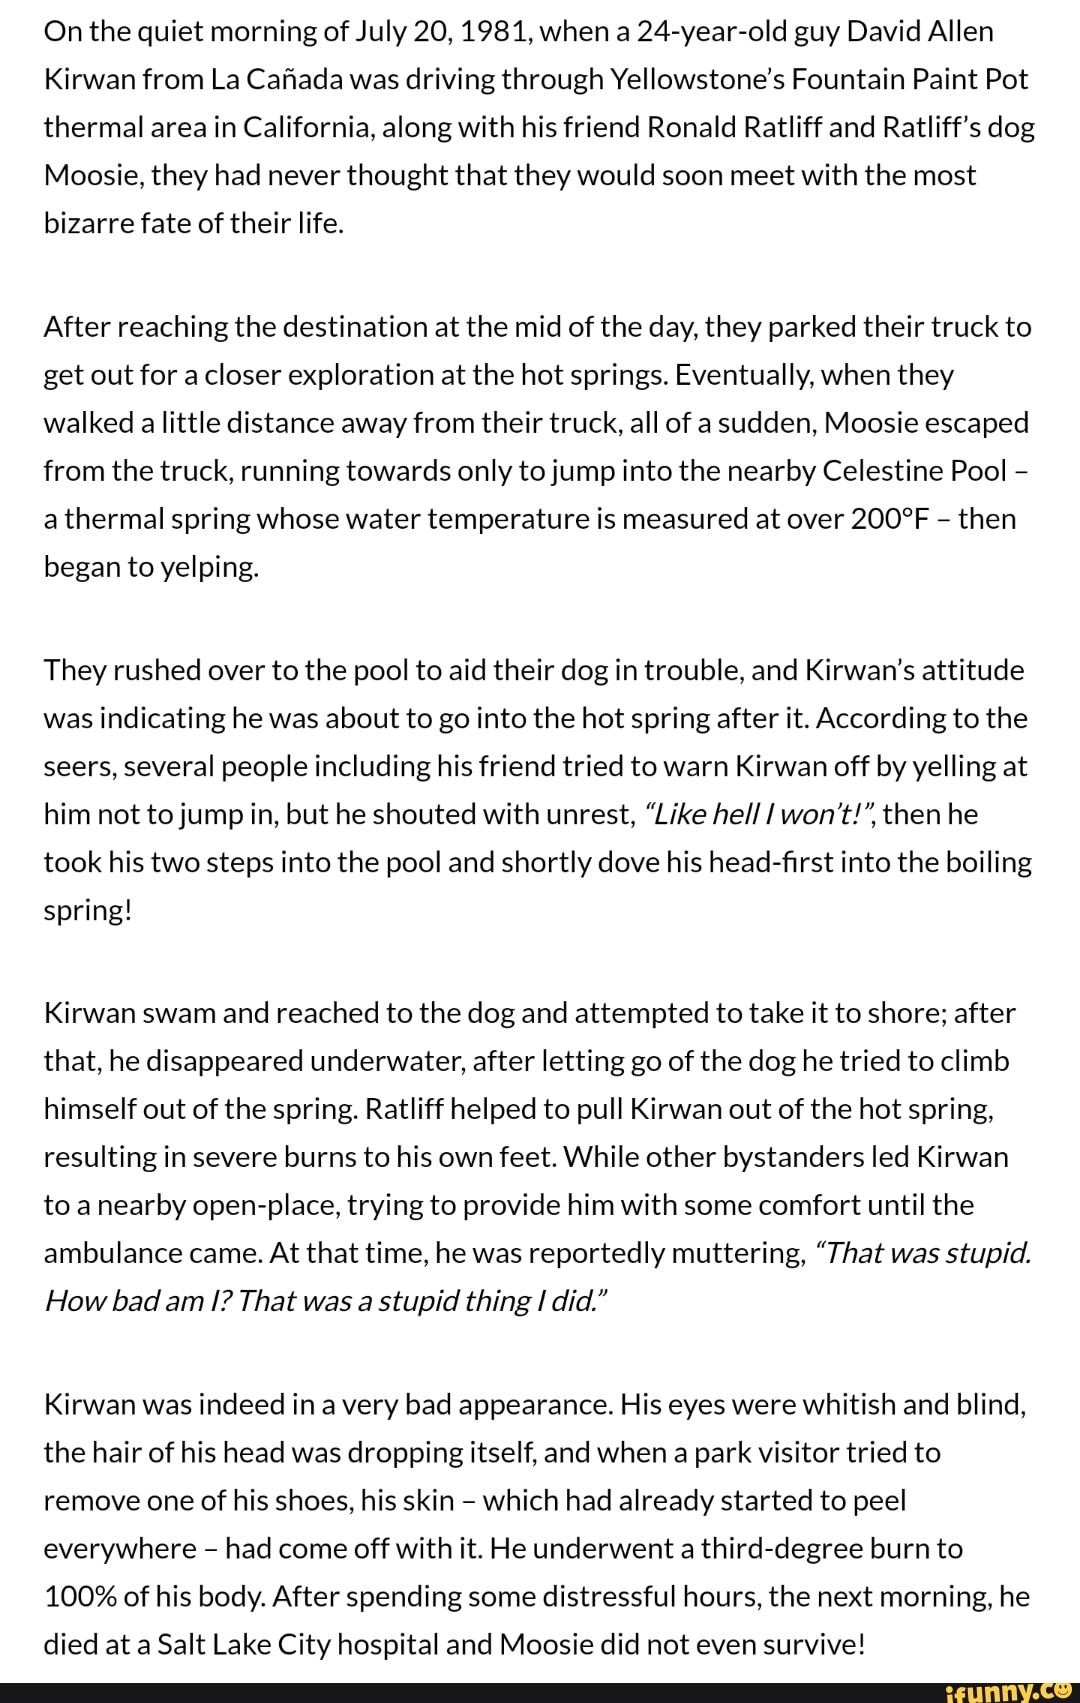 David Allen Kirwan : david, allen, kirwan, Quiet, Morning, 1981,, 24-year-old, David, Allen, Kirwan, Cafiada, Driving, Through, Yellowstone's, Fountain, Paint, Thermal, California,, Along